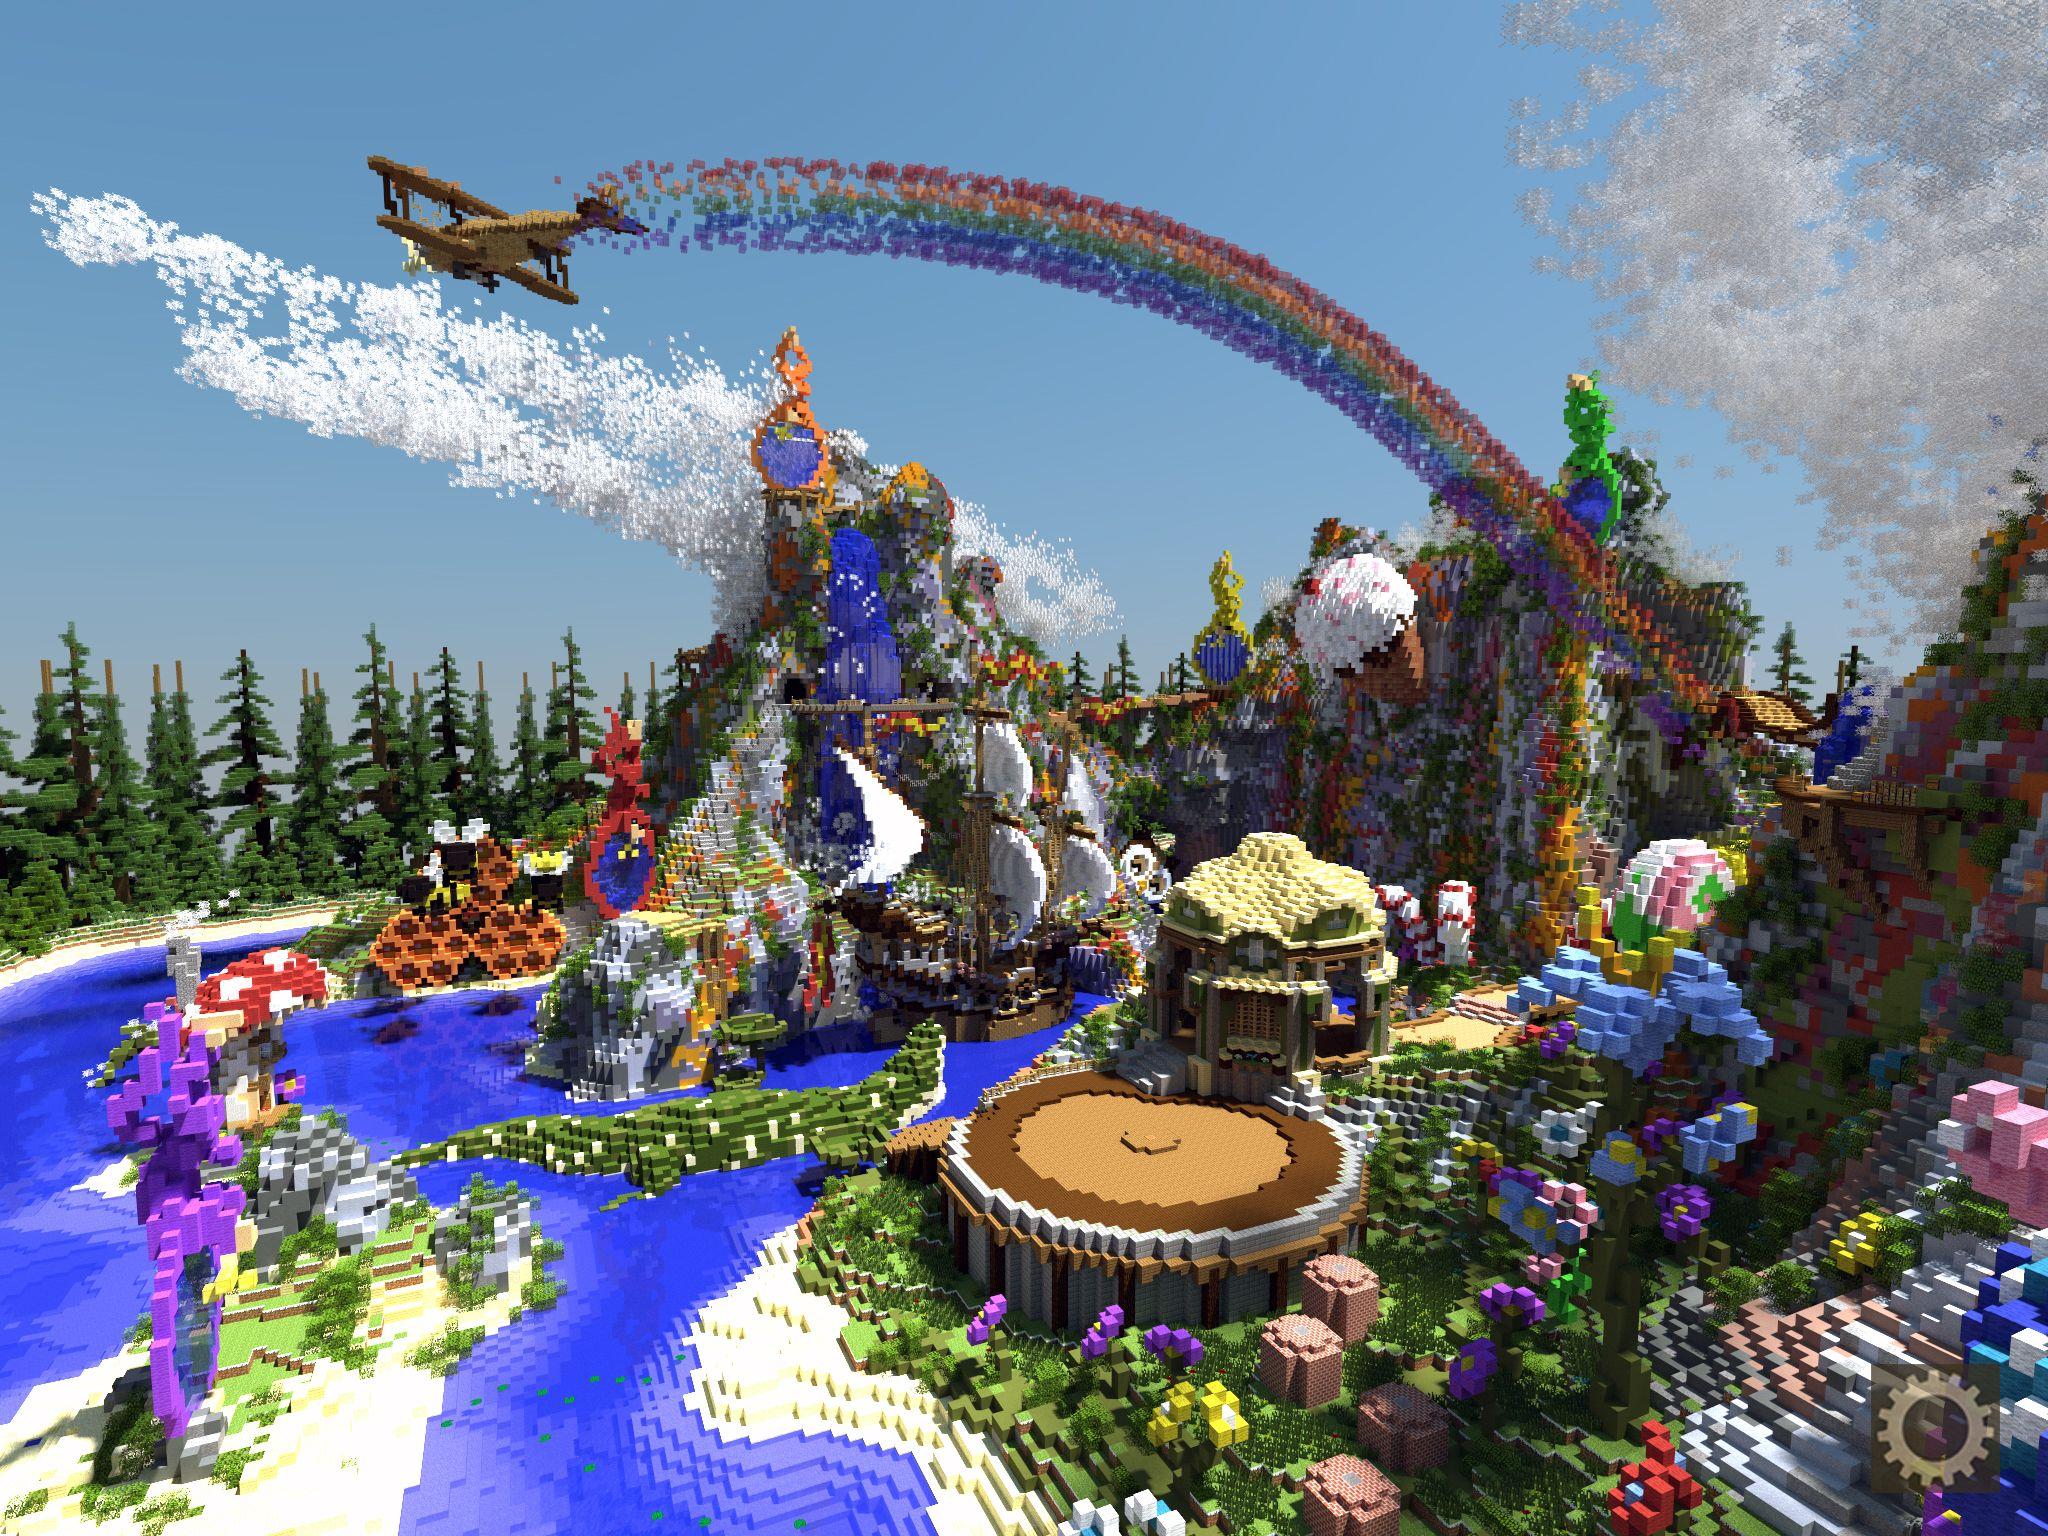 minecraft fairy land - Google Search | Minecraft 5 | Pinterest ...